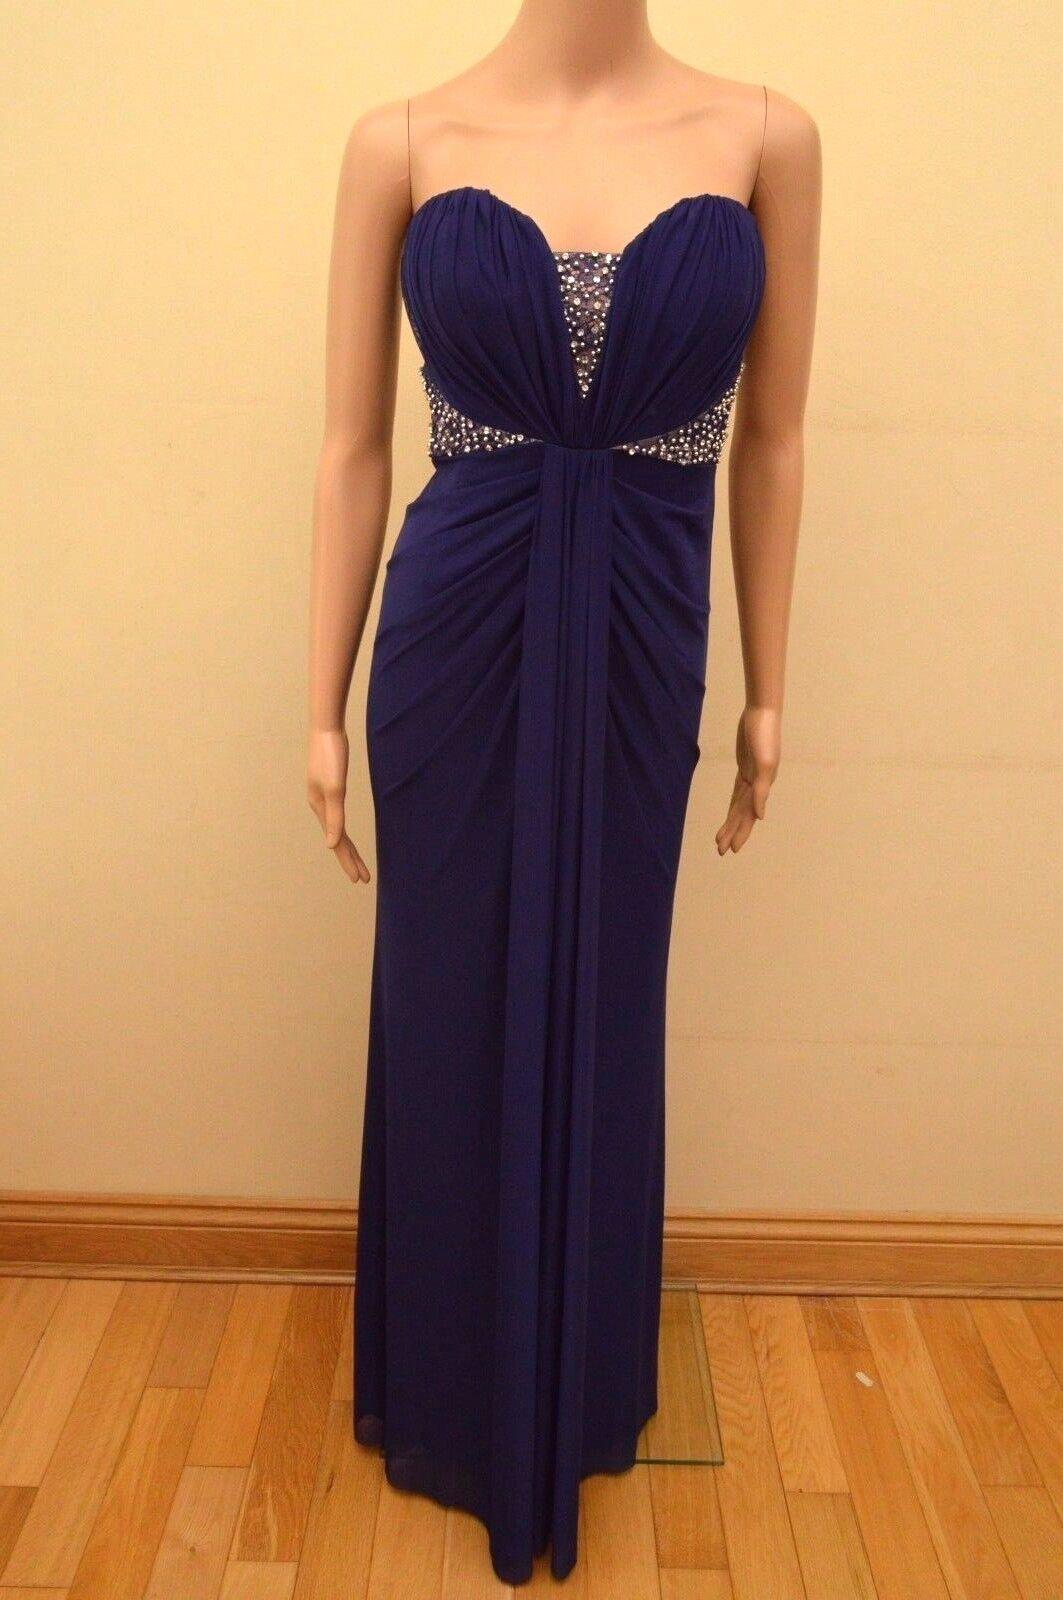 New Lipsy VIP Navy lila Diamante Sequin Bandeau Maxi Dress Sz